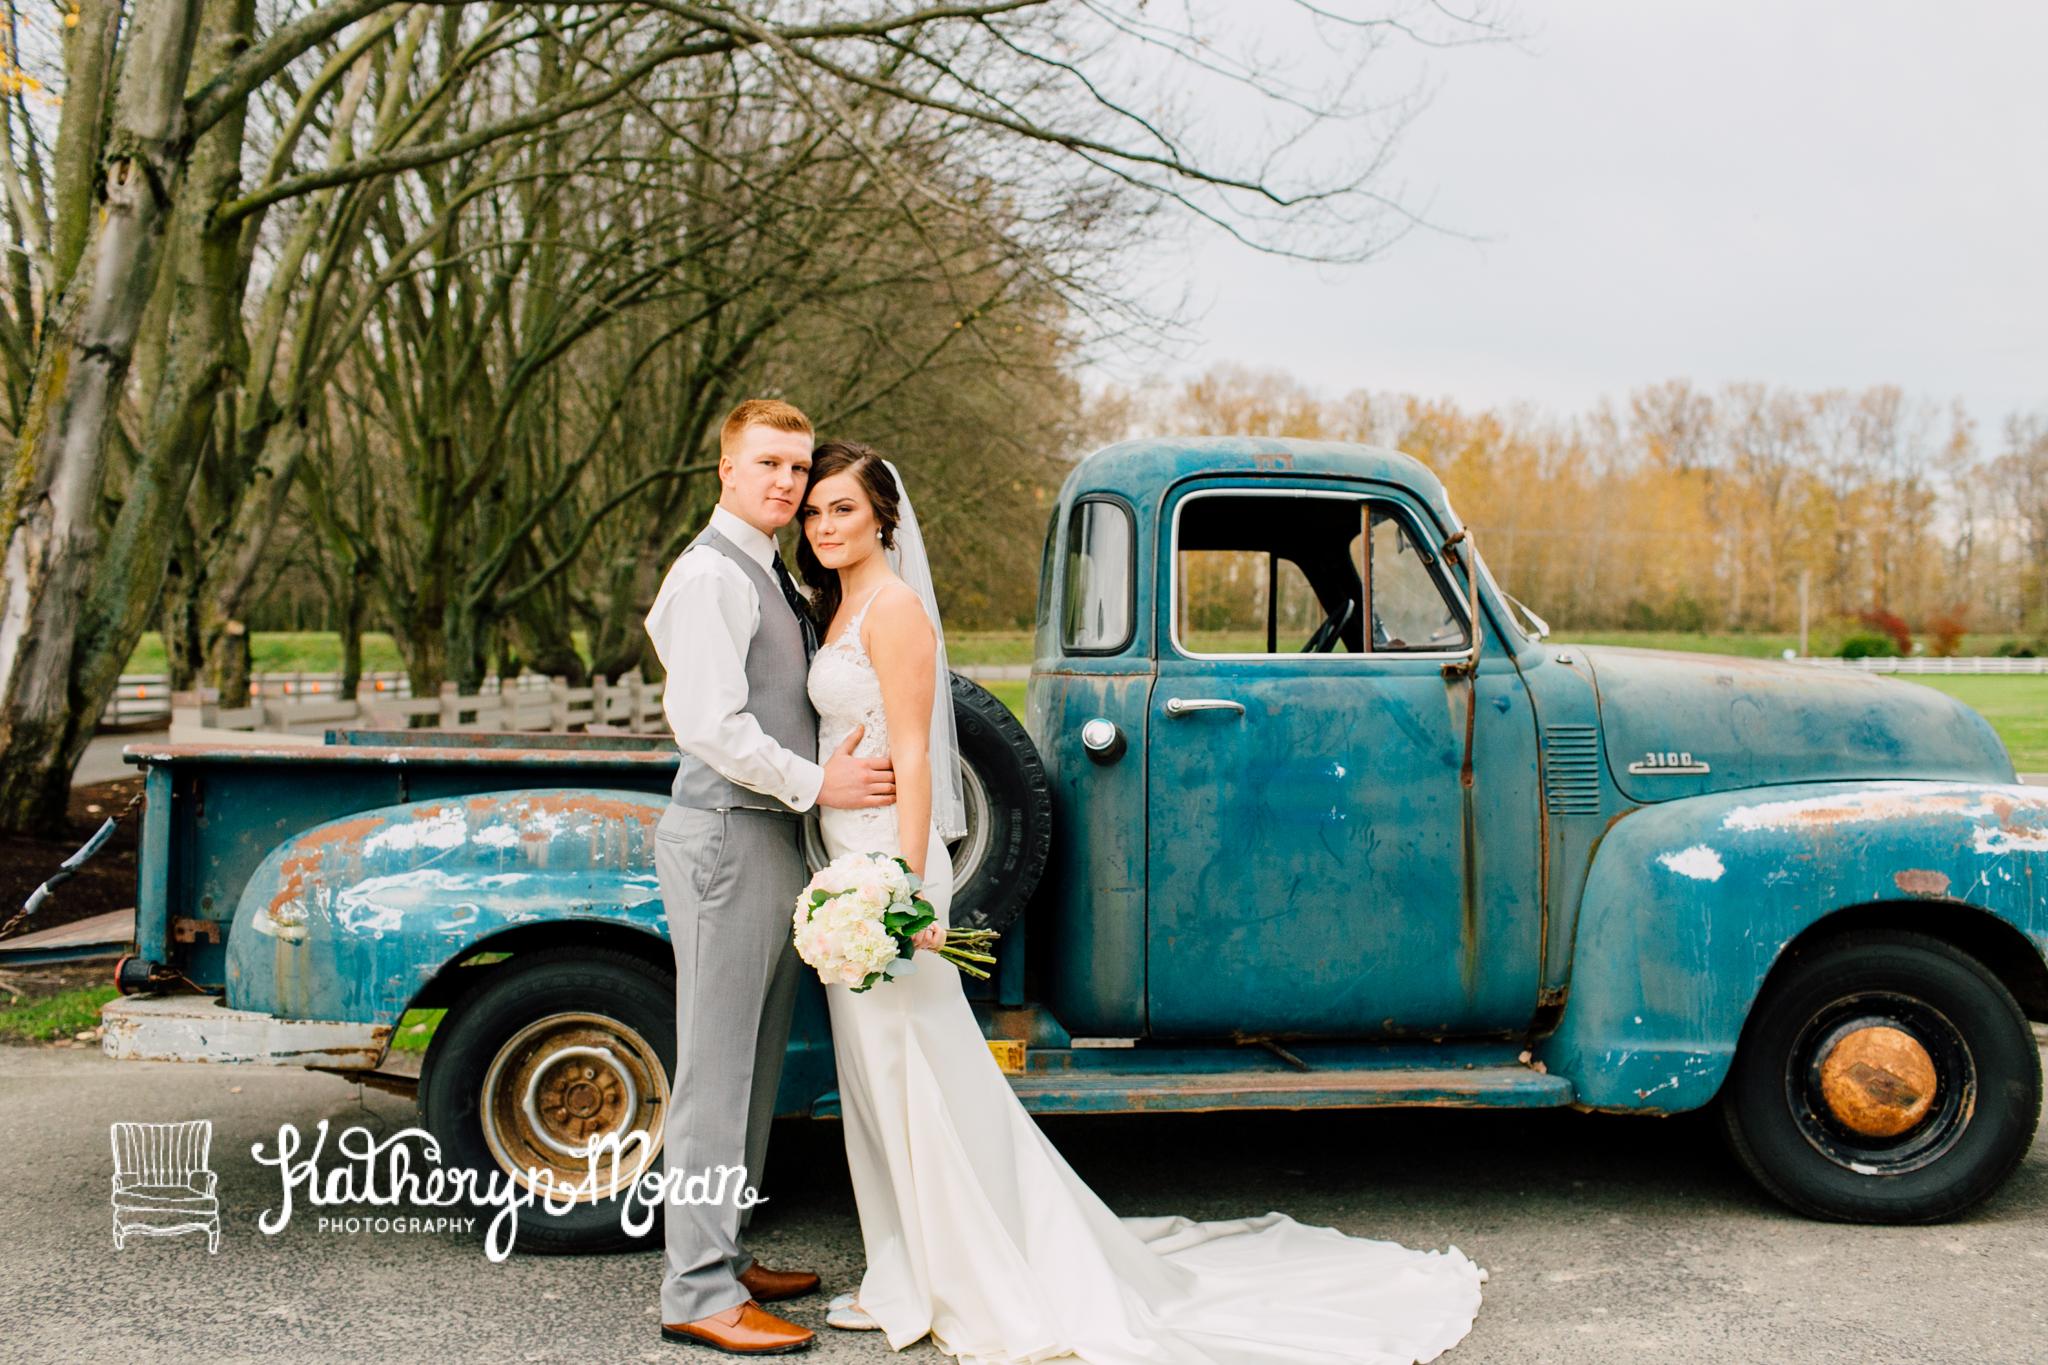 maplehurst-farm-wedding-katheryn-moran-photography-koogle-6.jpg